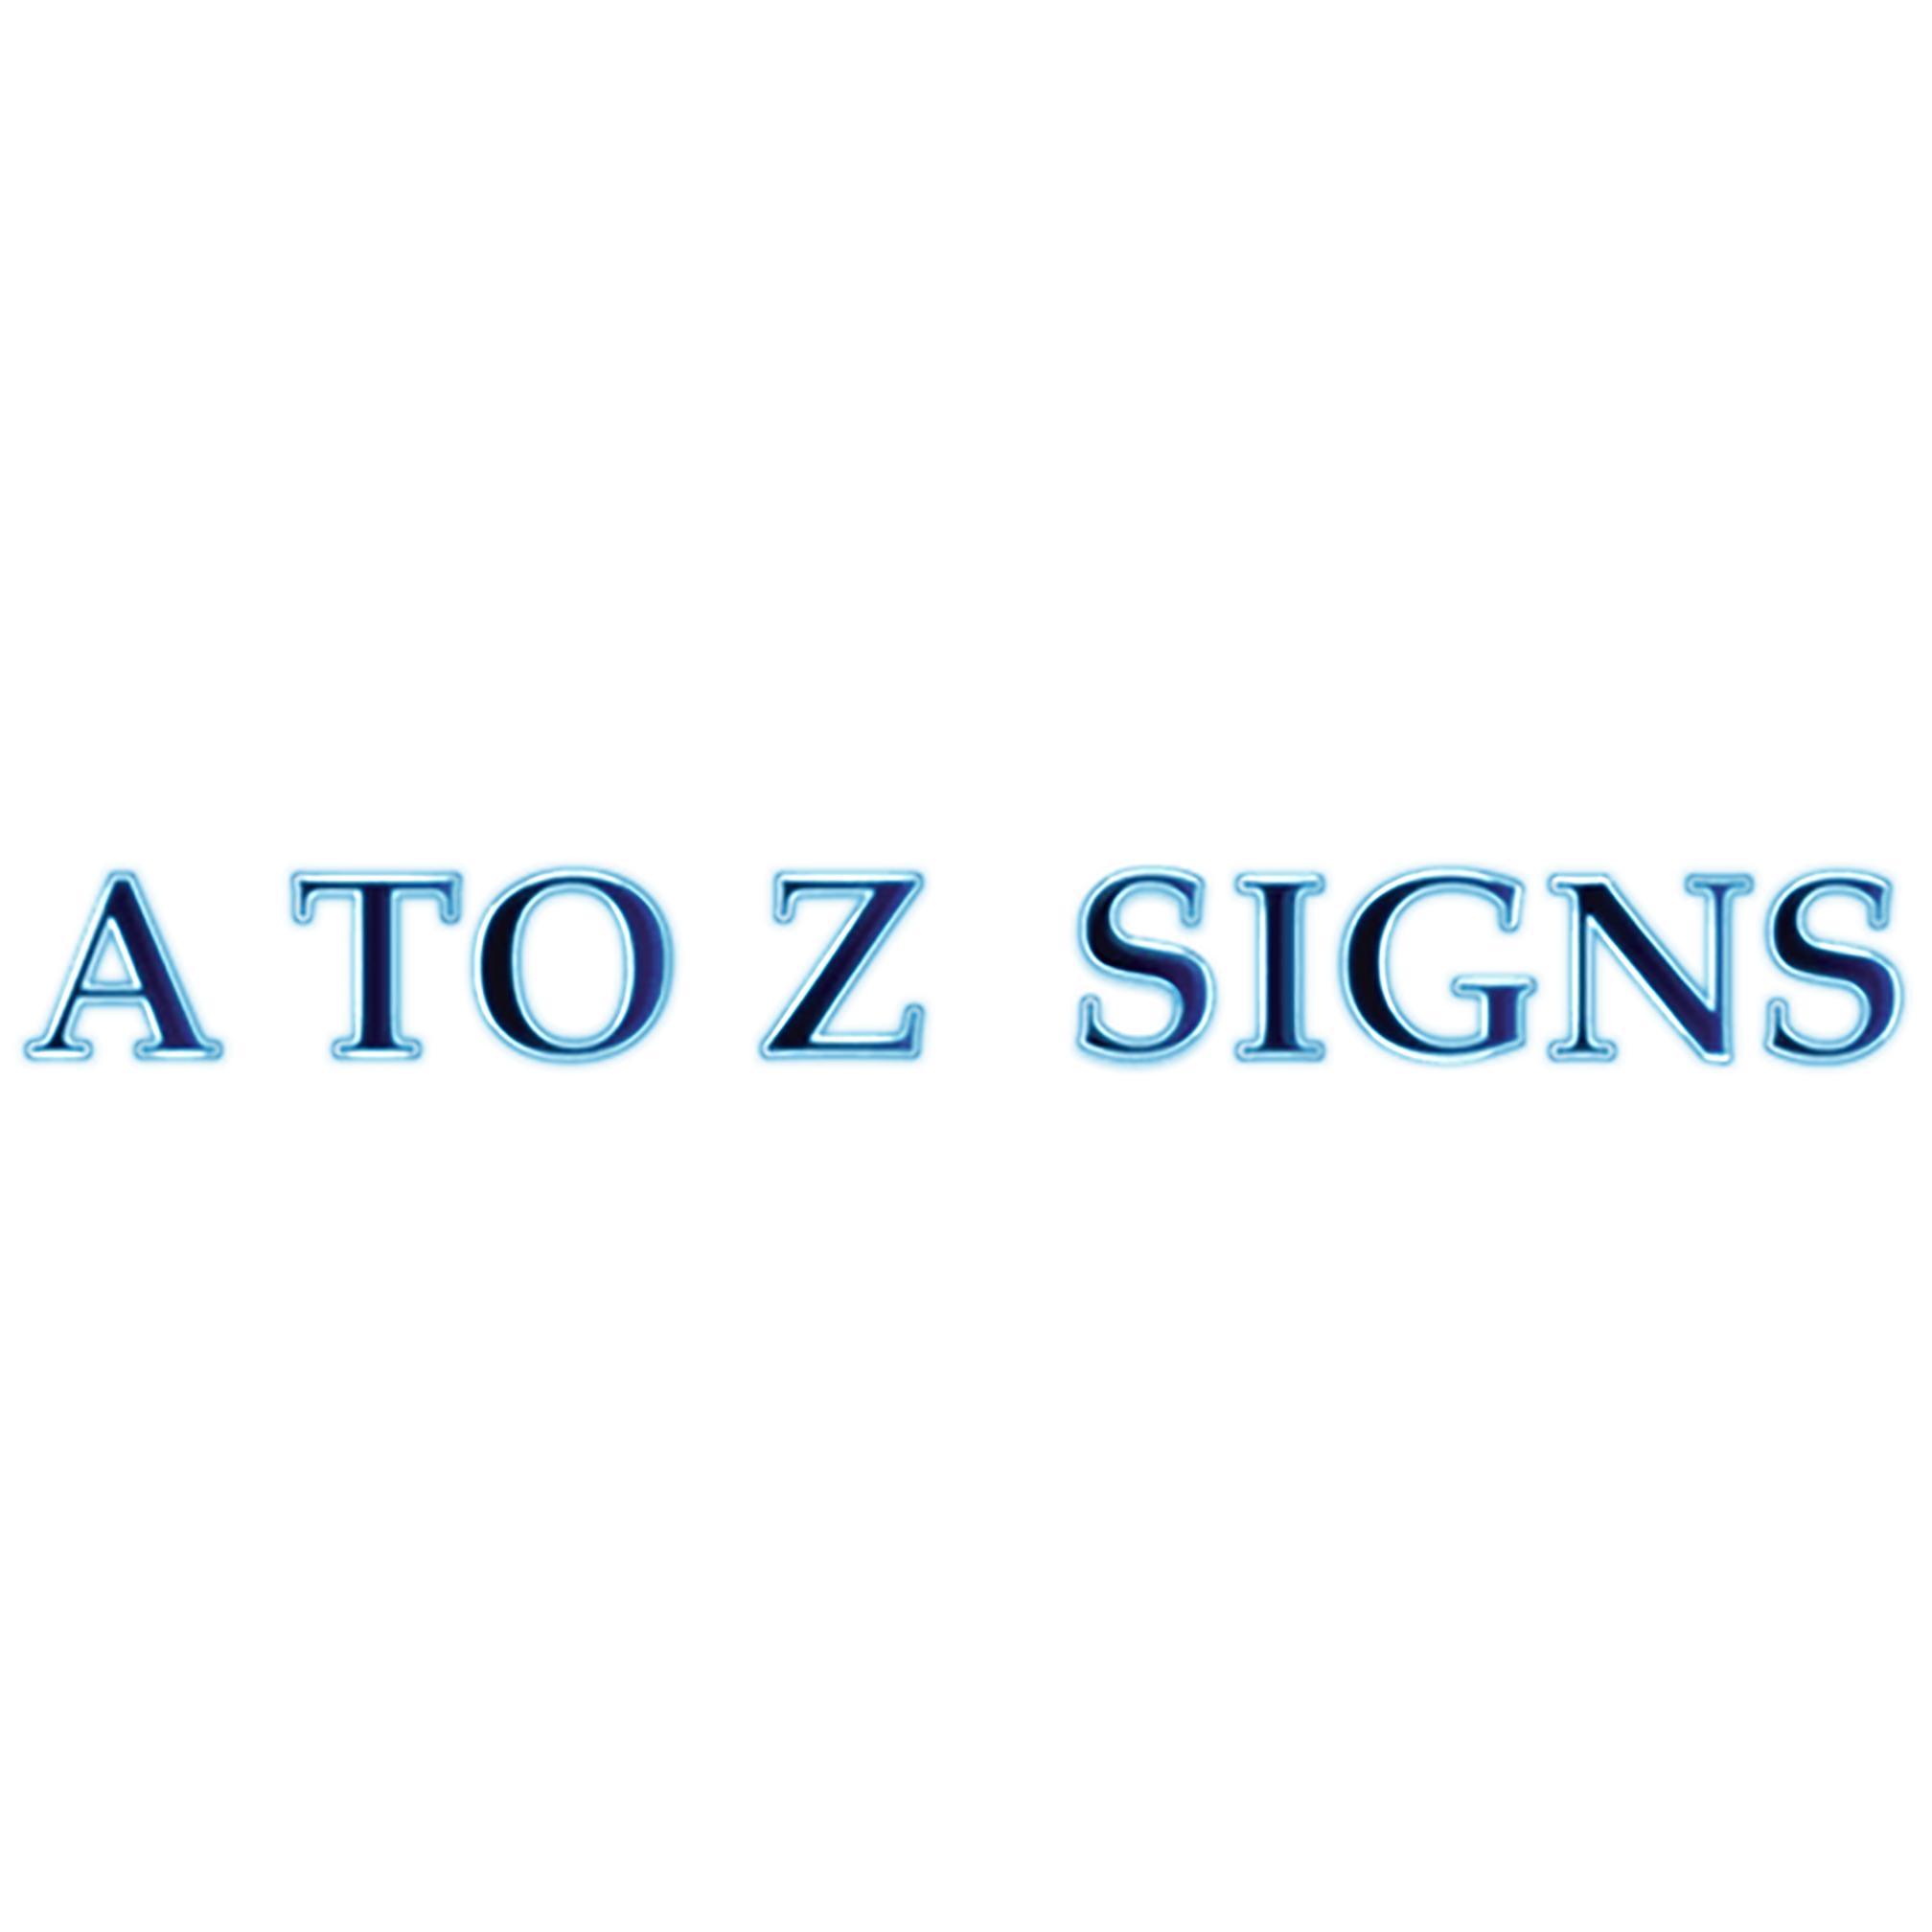 AToZ Signs - Gresham